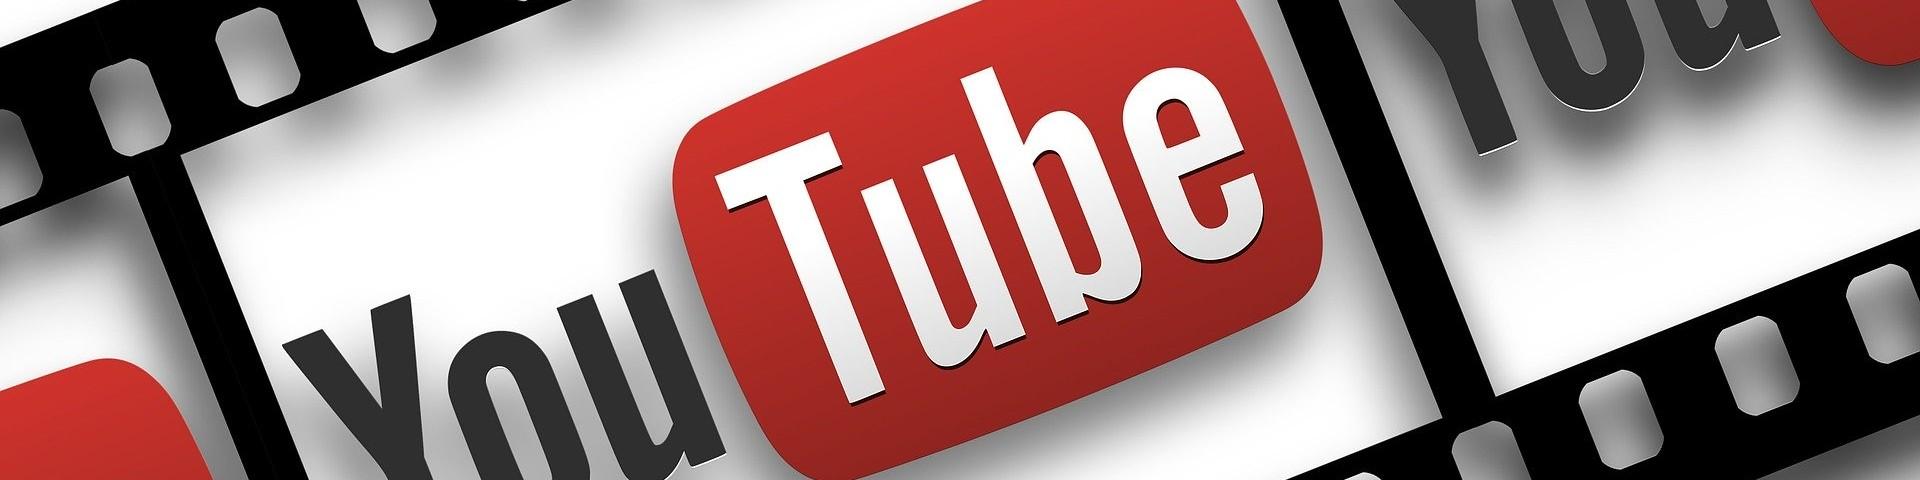 Youtube Kündigen